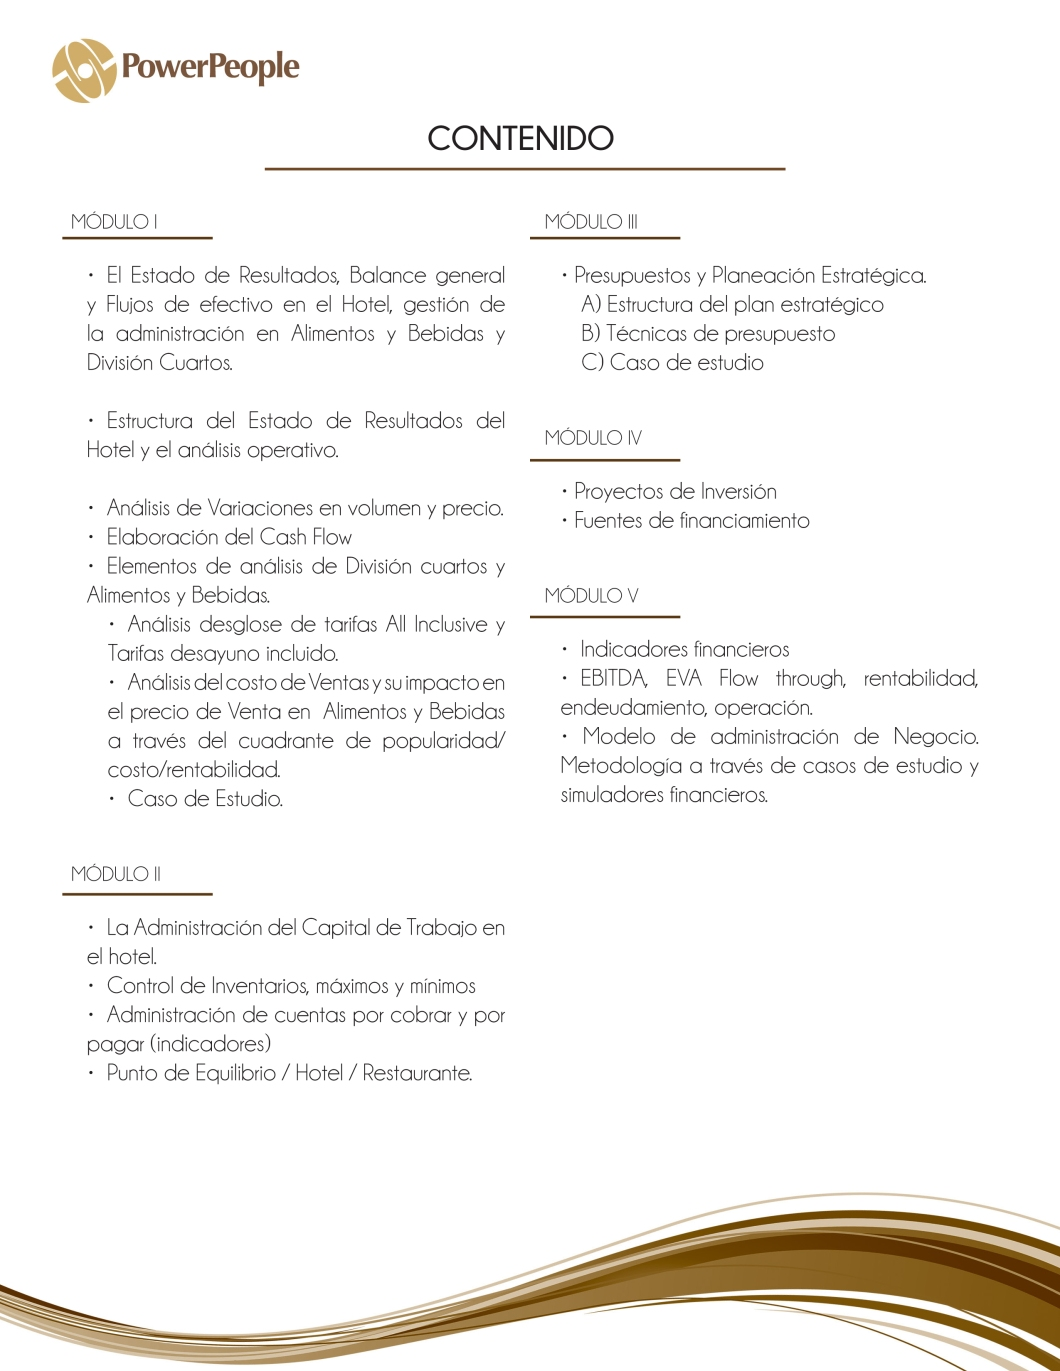 Presentacion Power People 2015-10